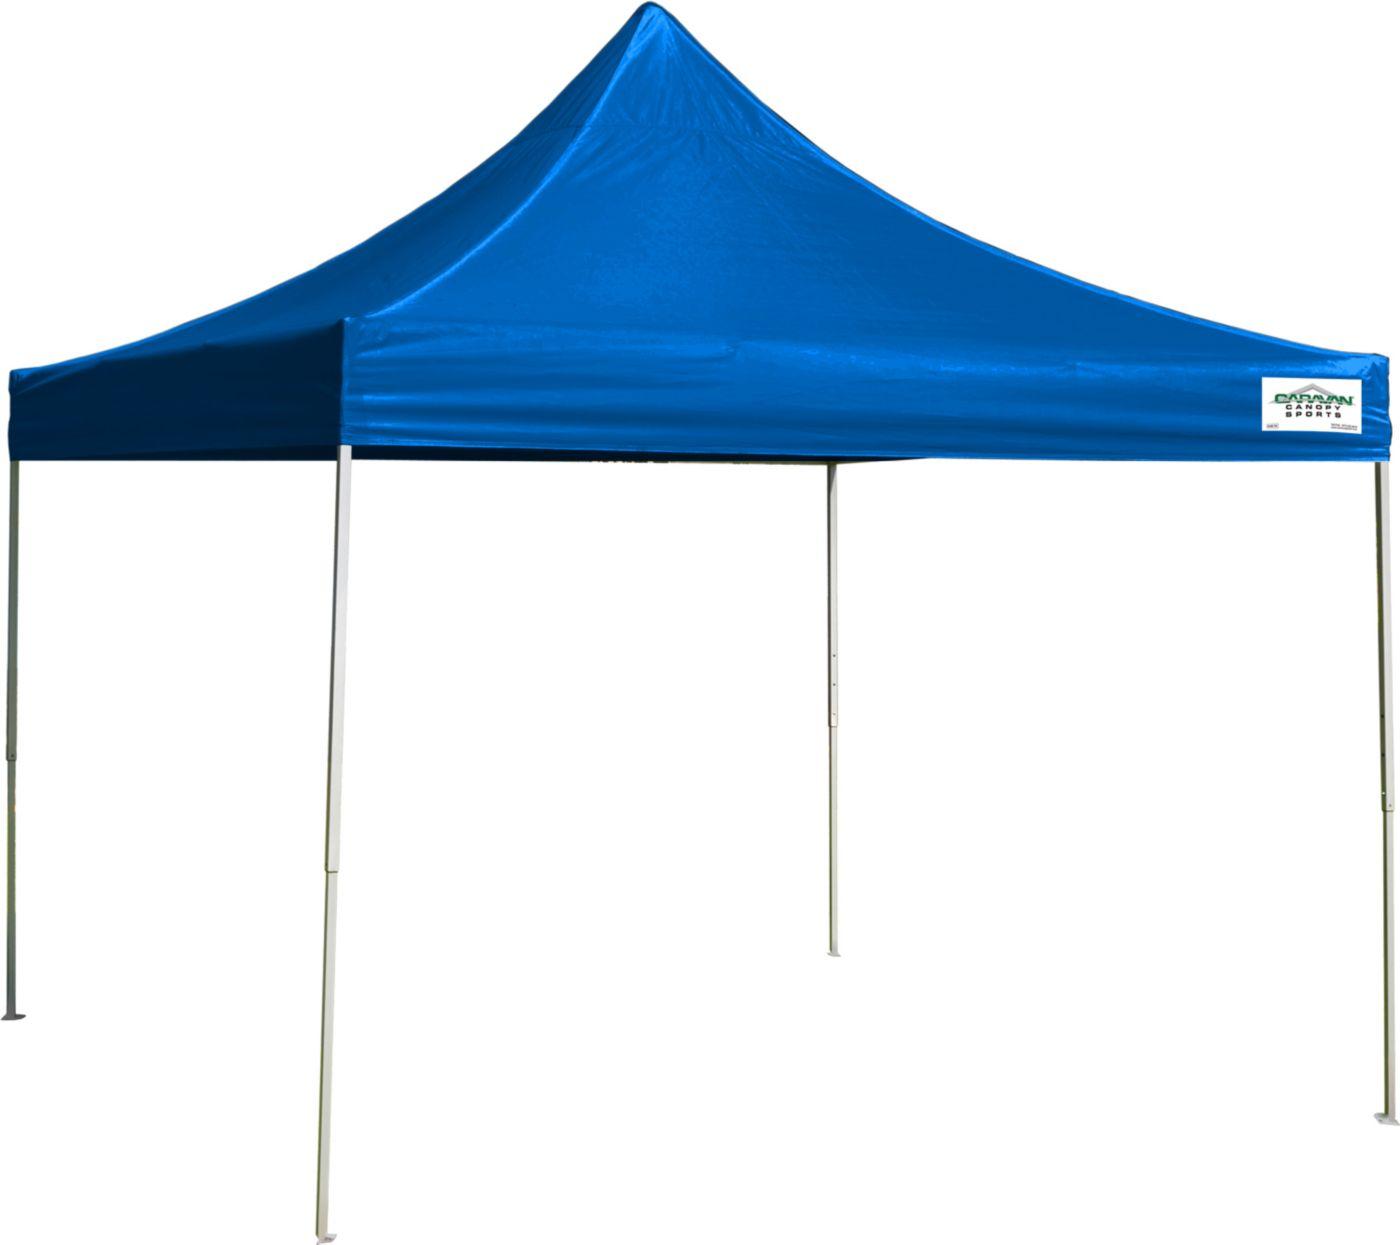 Caravan Canopy 10' x 10' M-Series 2 Pro Canopy